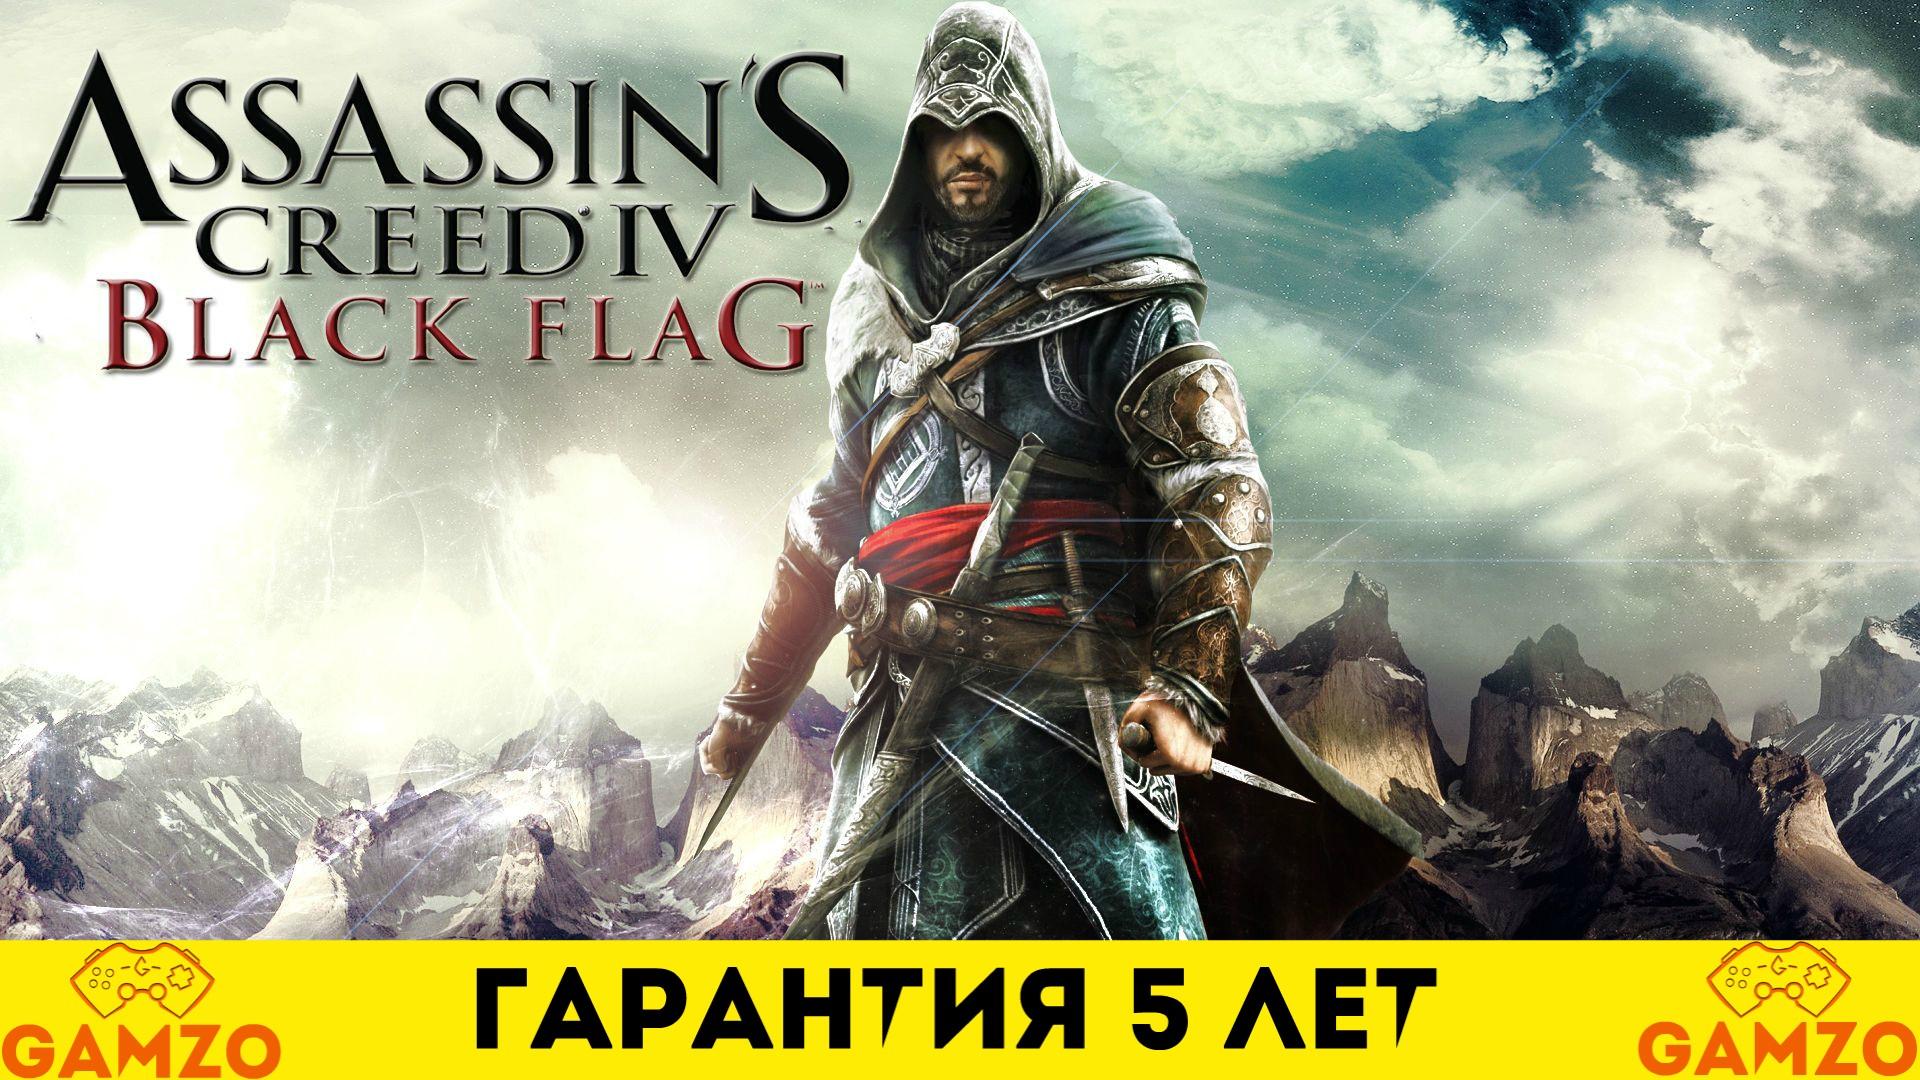 Assassins Creed: Black Flag [Гарантия 5 лет] + Подарок